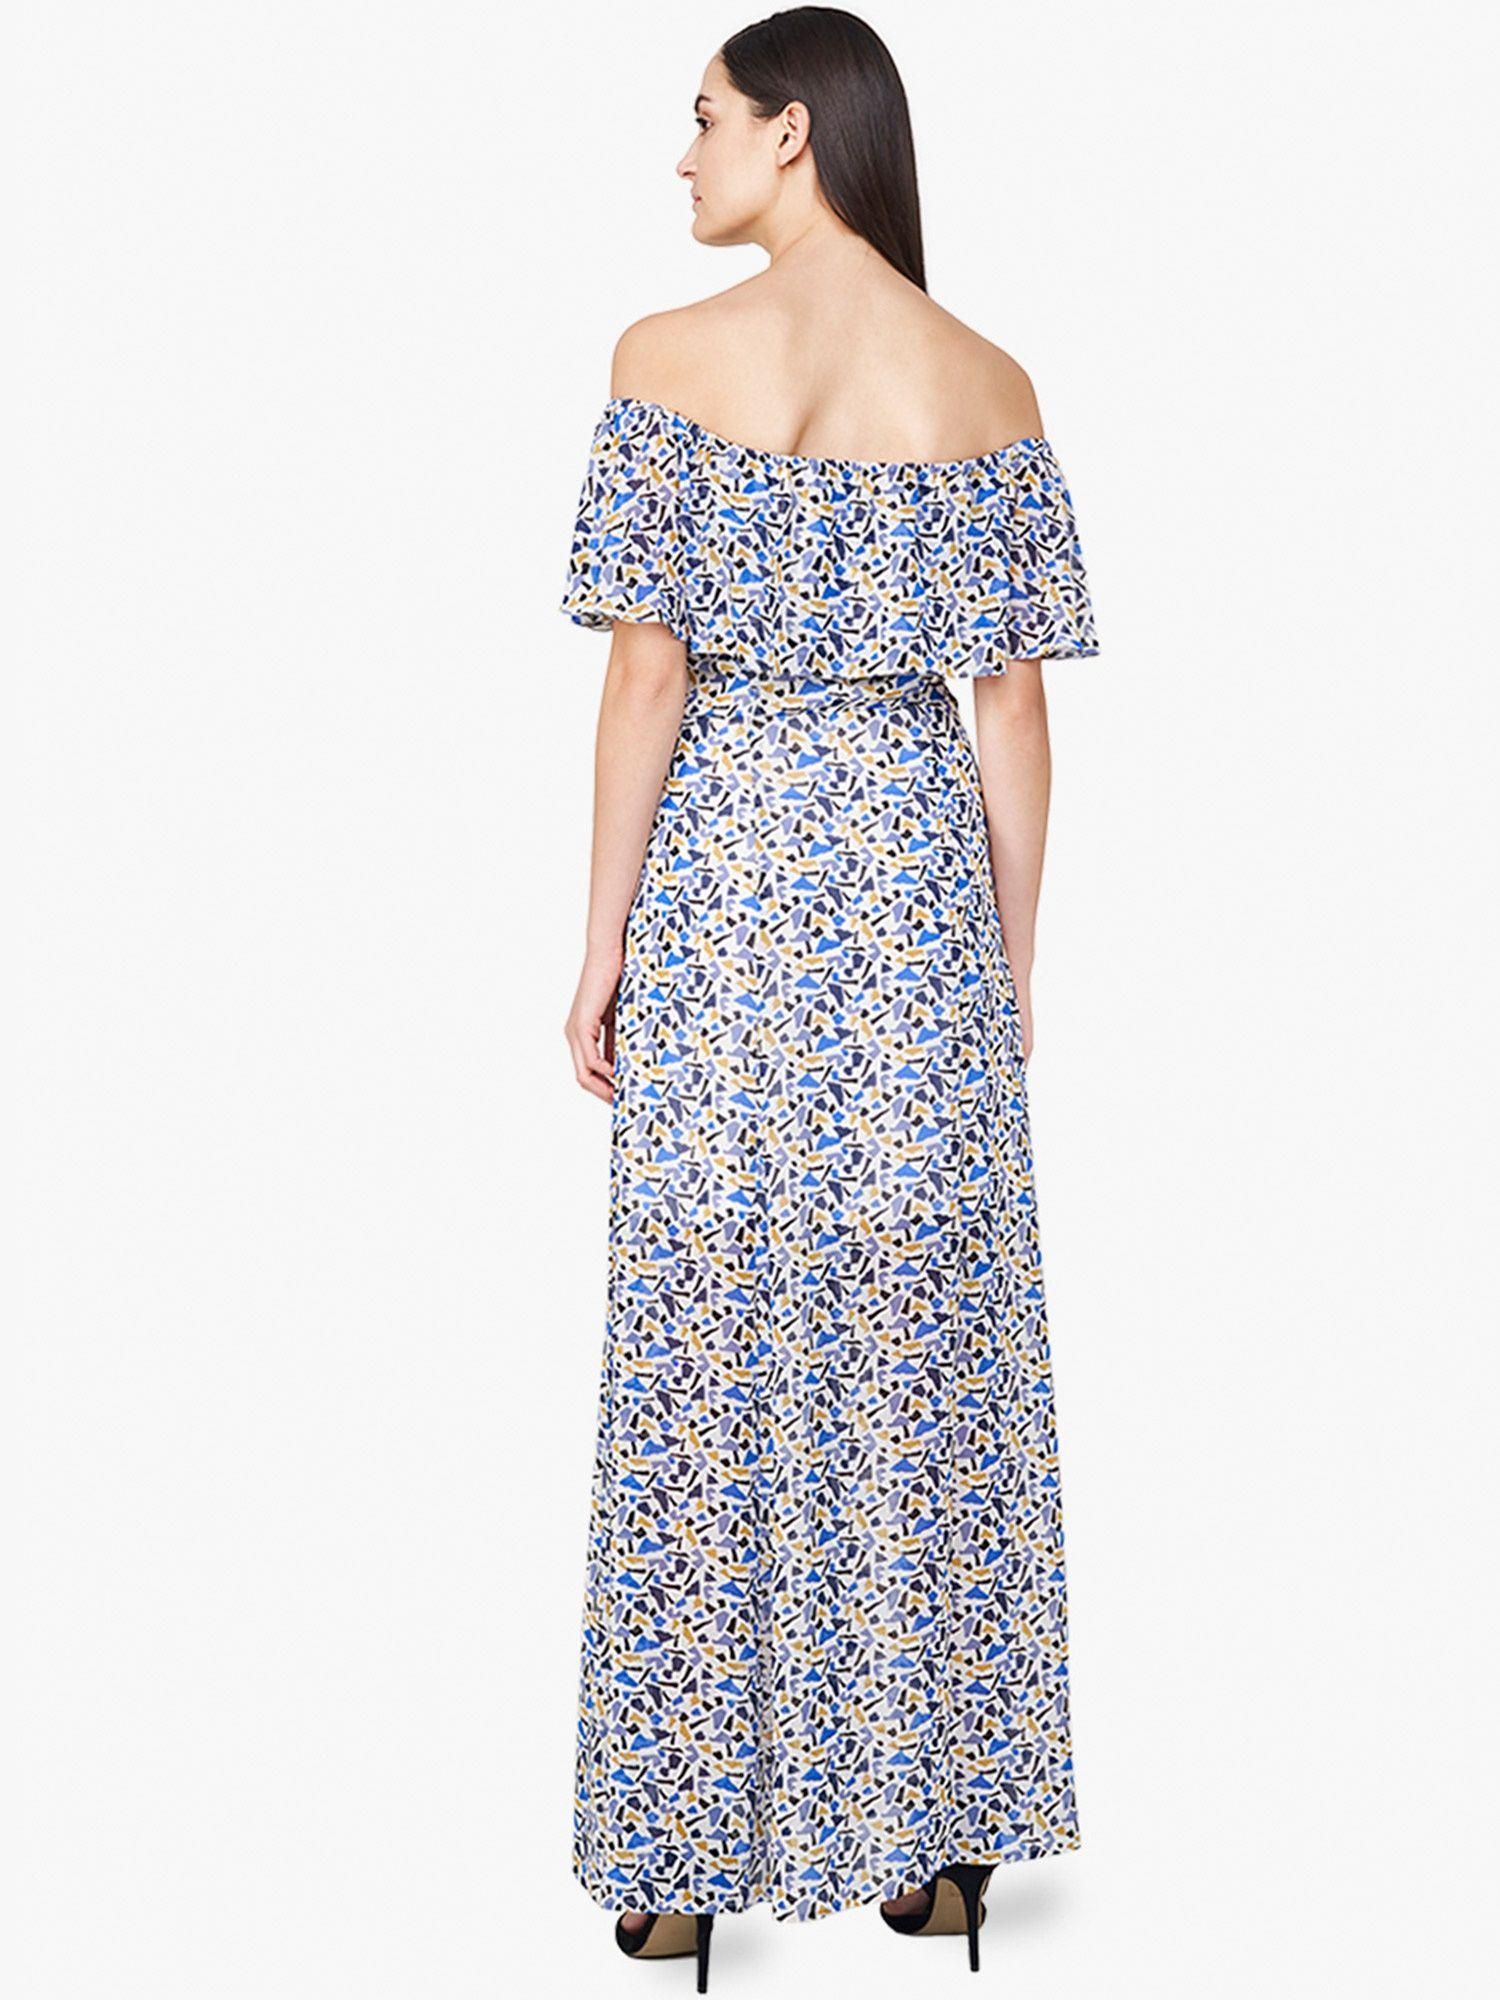 8f55780aa5f2 AND Dresses   Buy AND Blue Mosaic Print Off Shoulder Maxi Dress ...